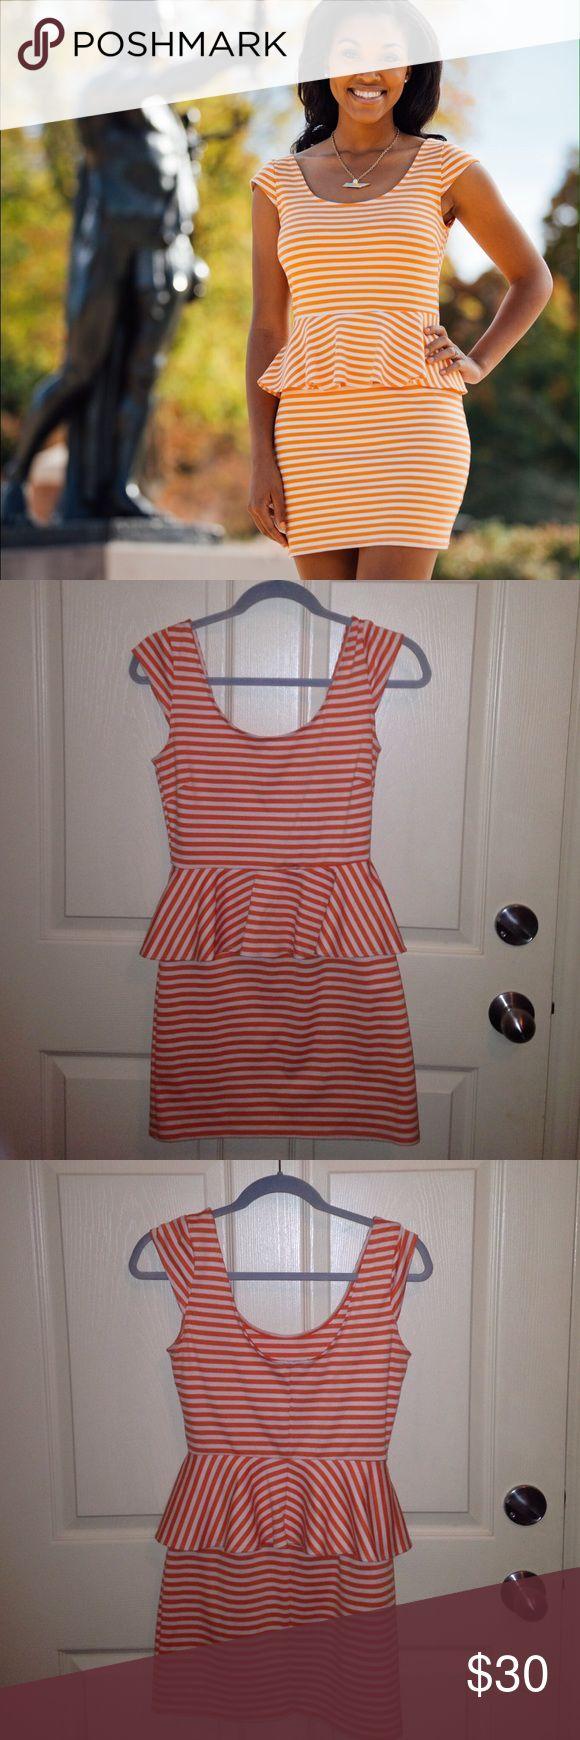 Orange and White Striped peplum dress Perfect for UT football games! Go Vols! Orange and White striped peplum dress. Speechless Dresses Mini